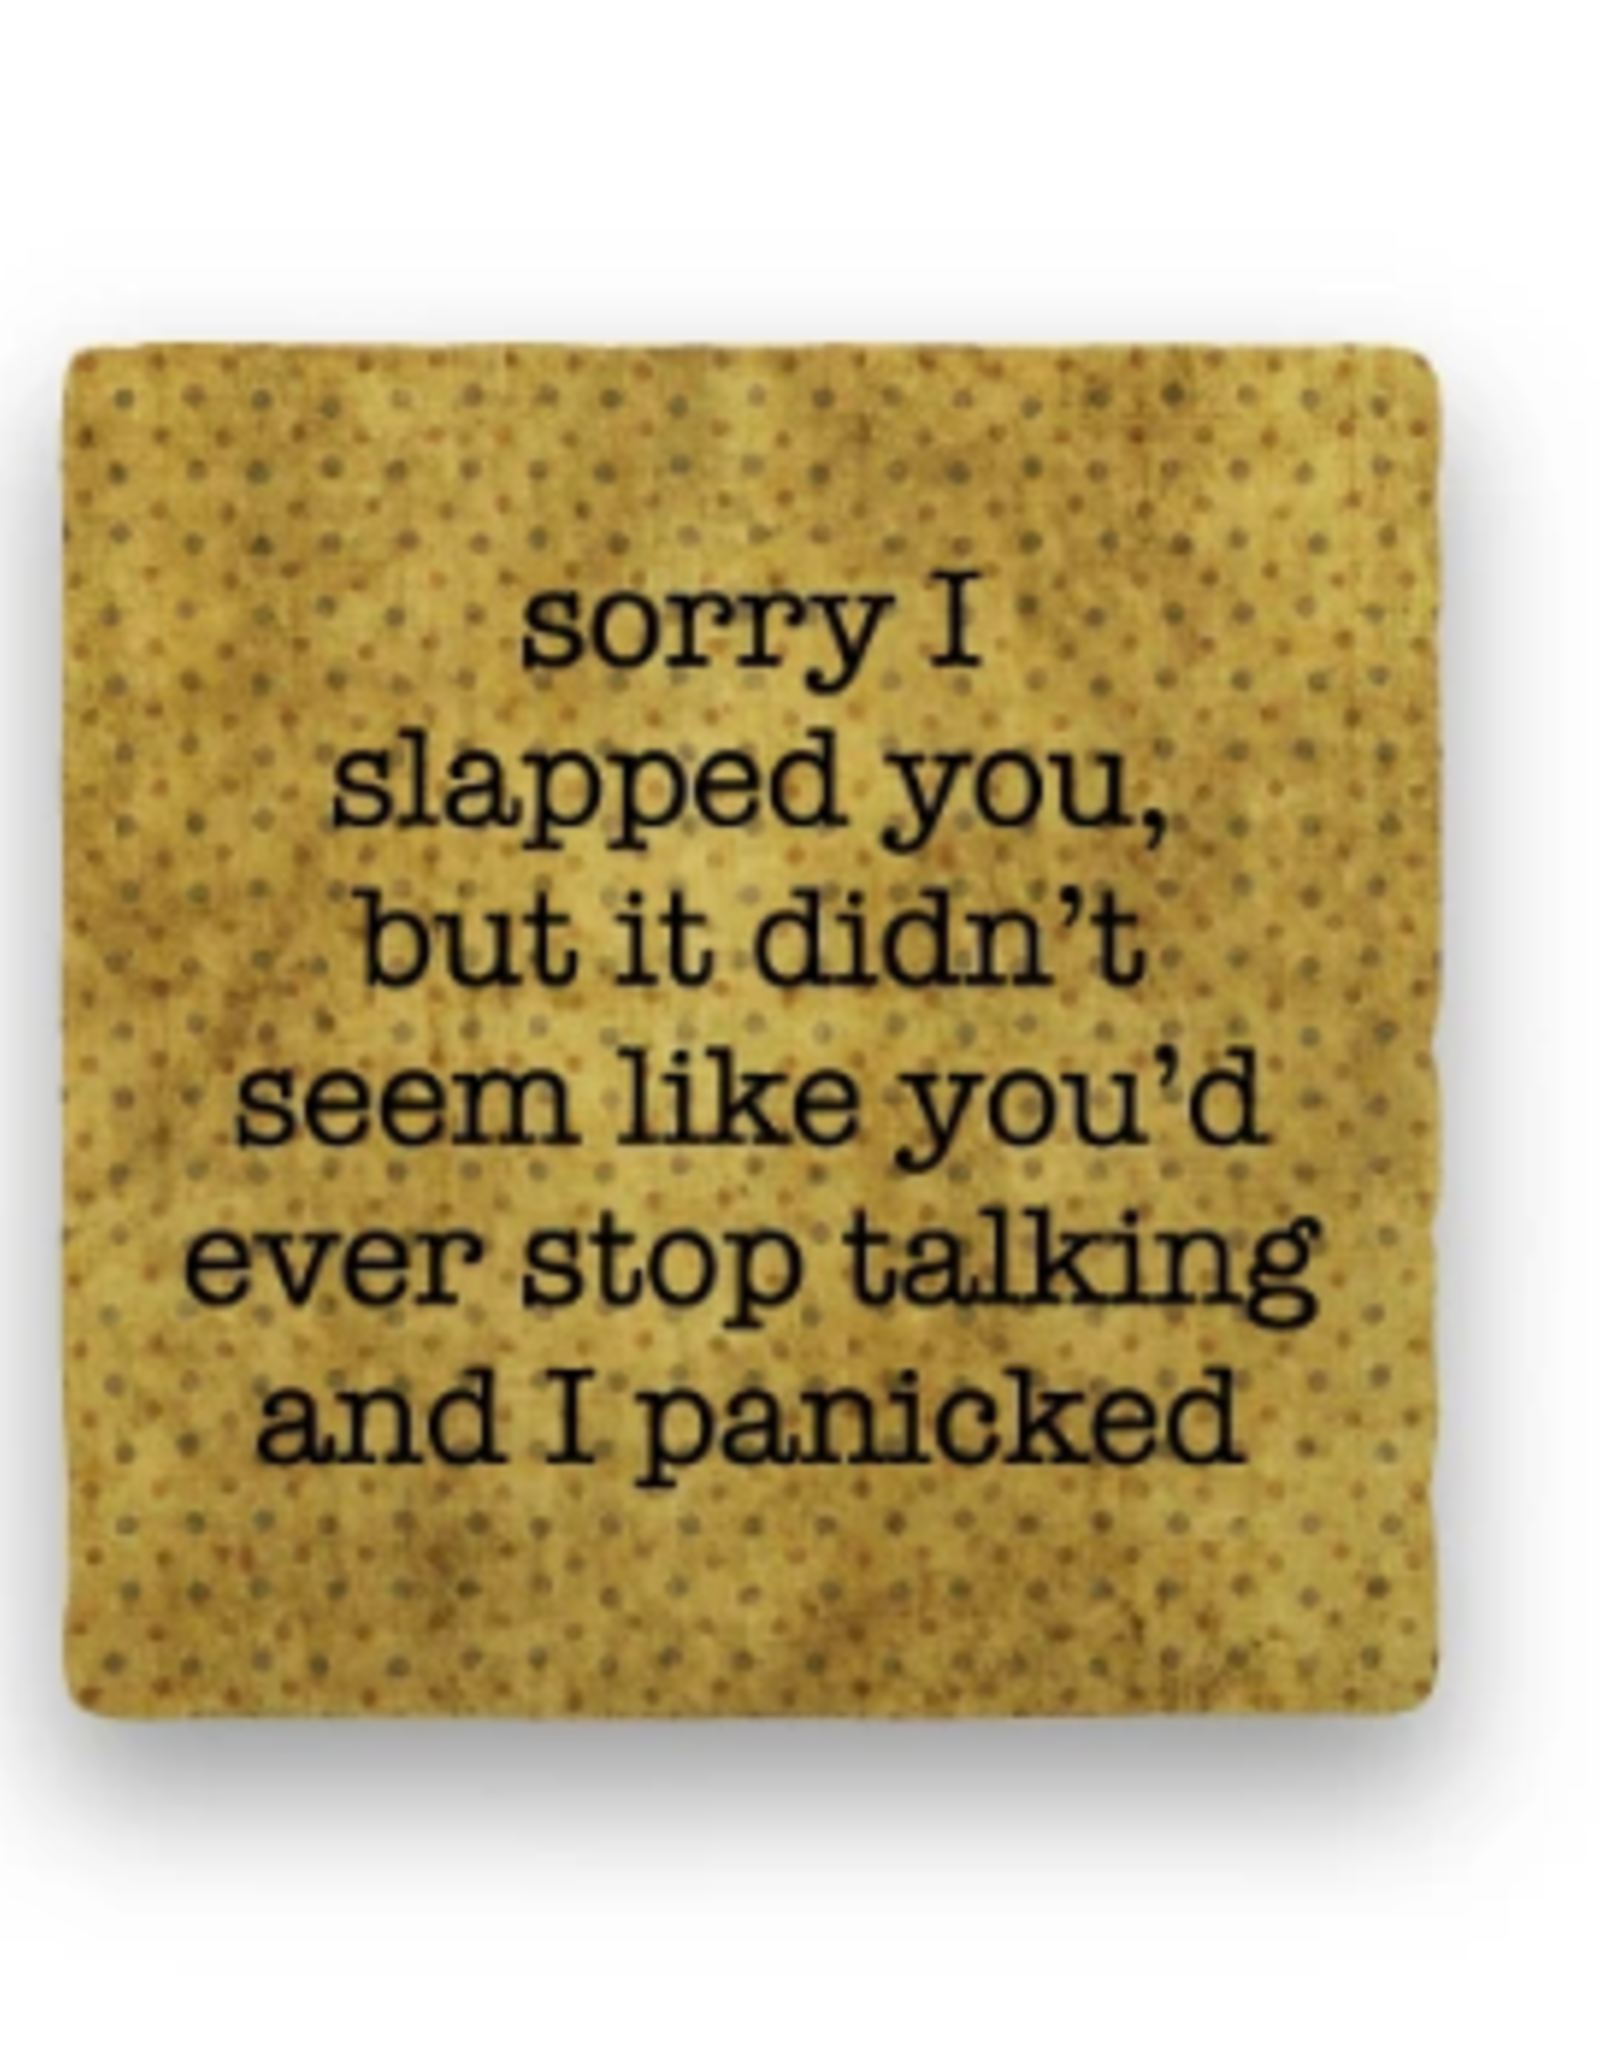 Paisley & Parsley Designs Coaster, Slapped You